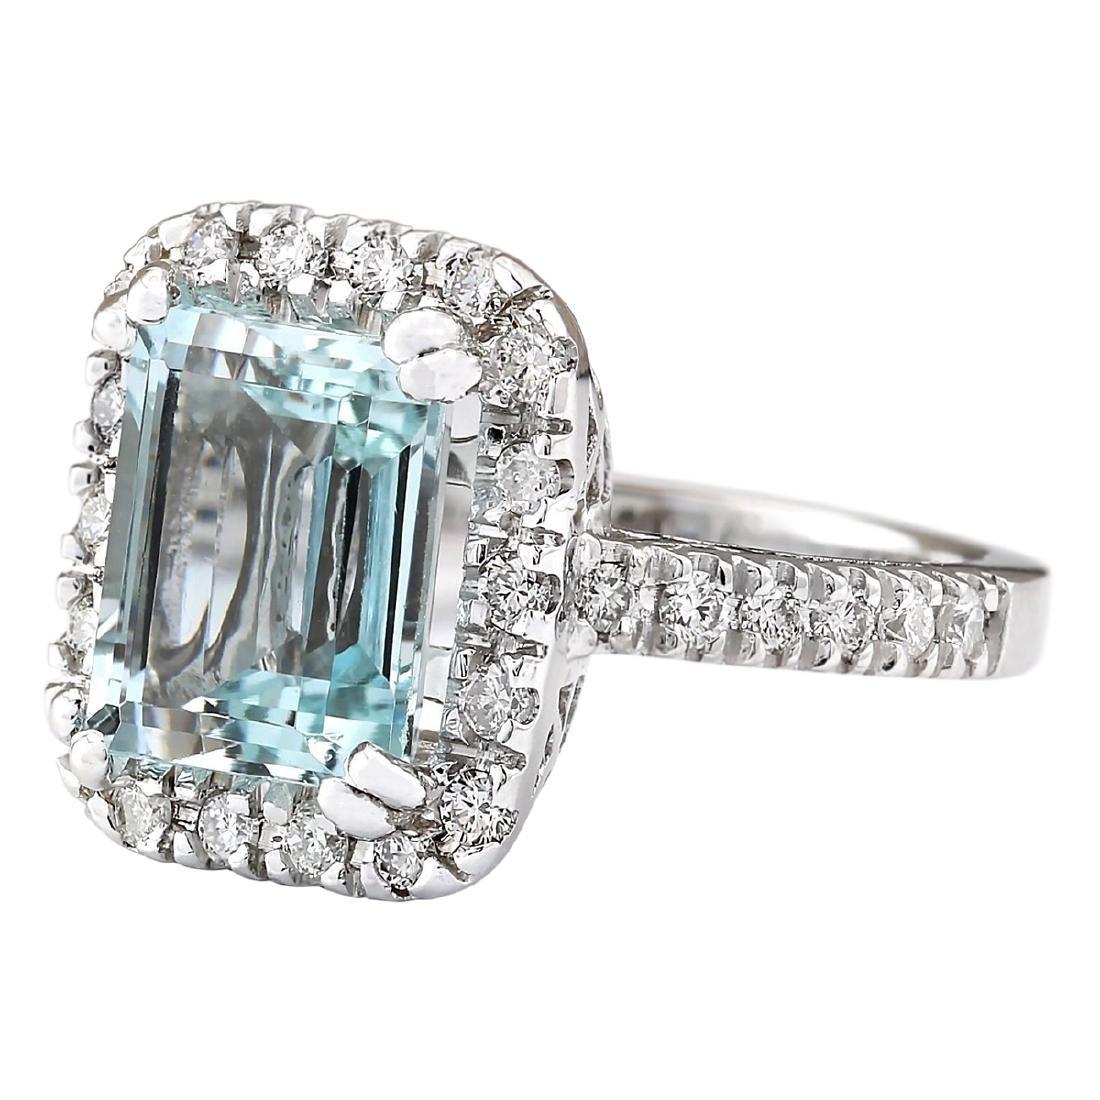 5.63 CTW Natural Aquamarine And Diamond Ring In 18K - 2